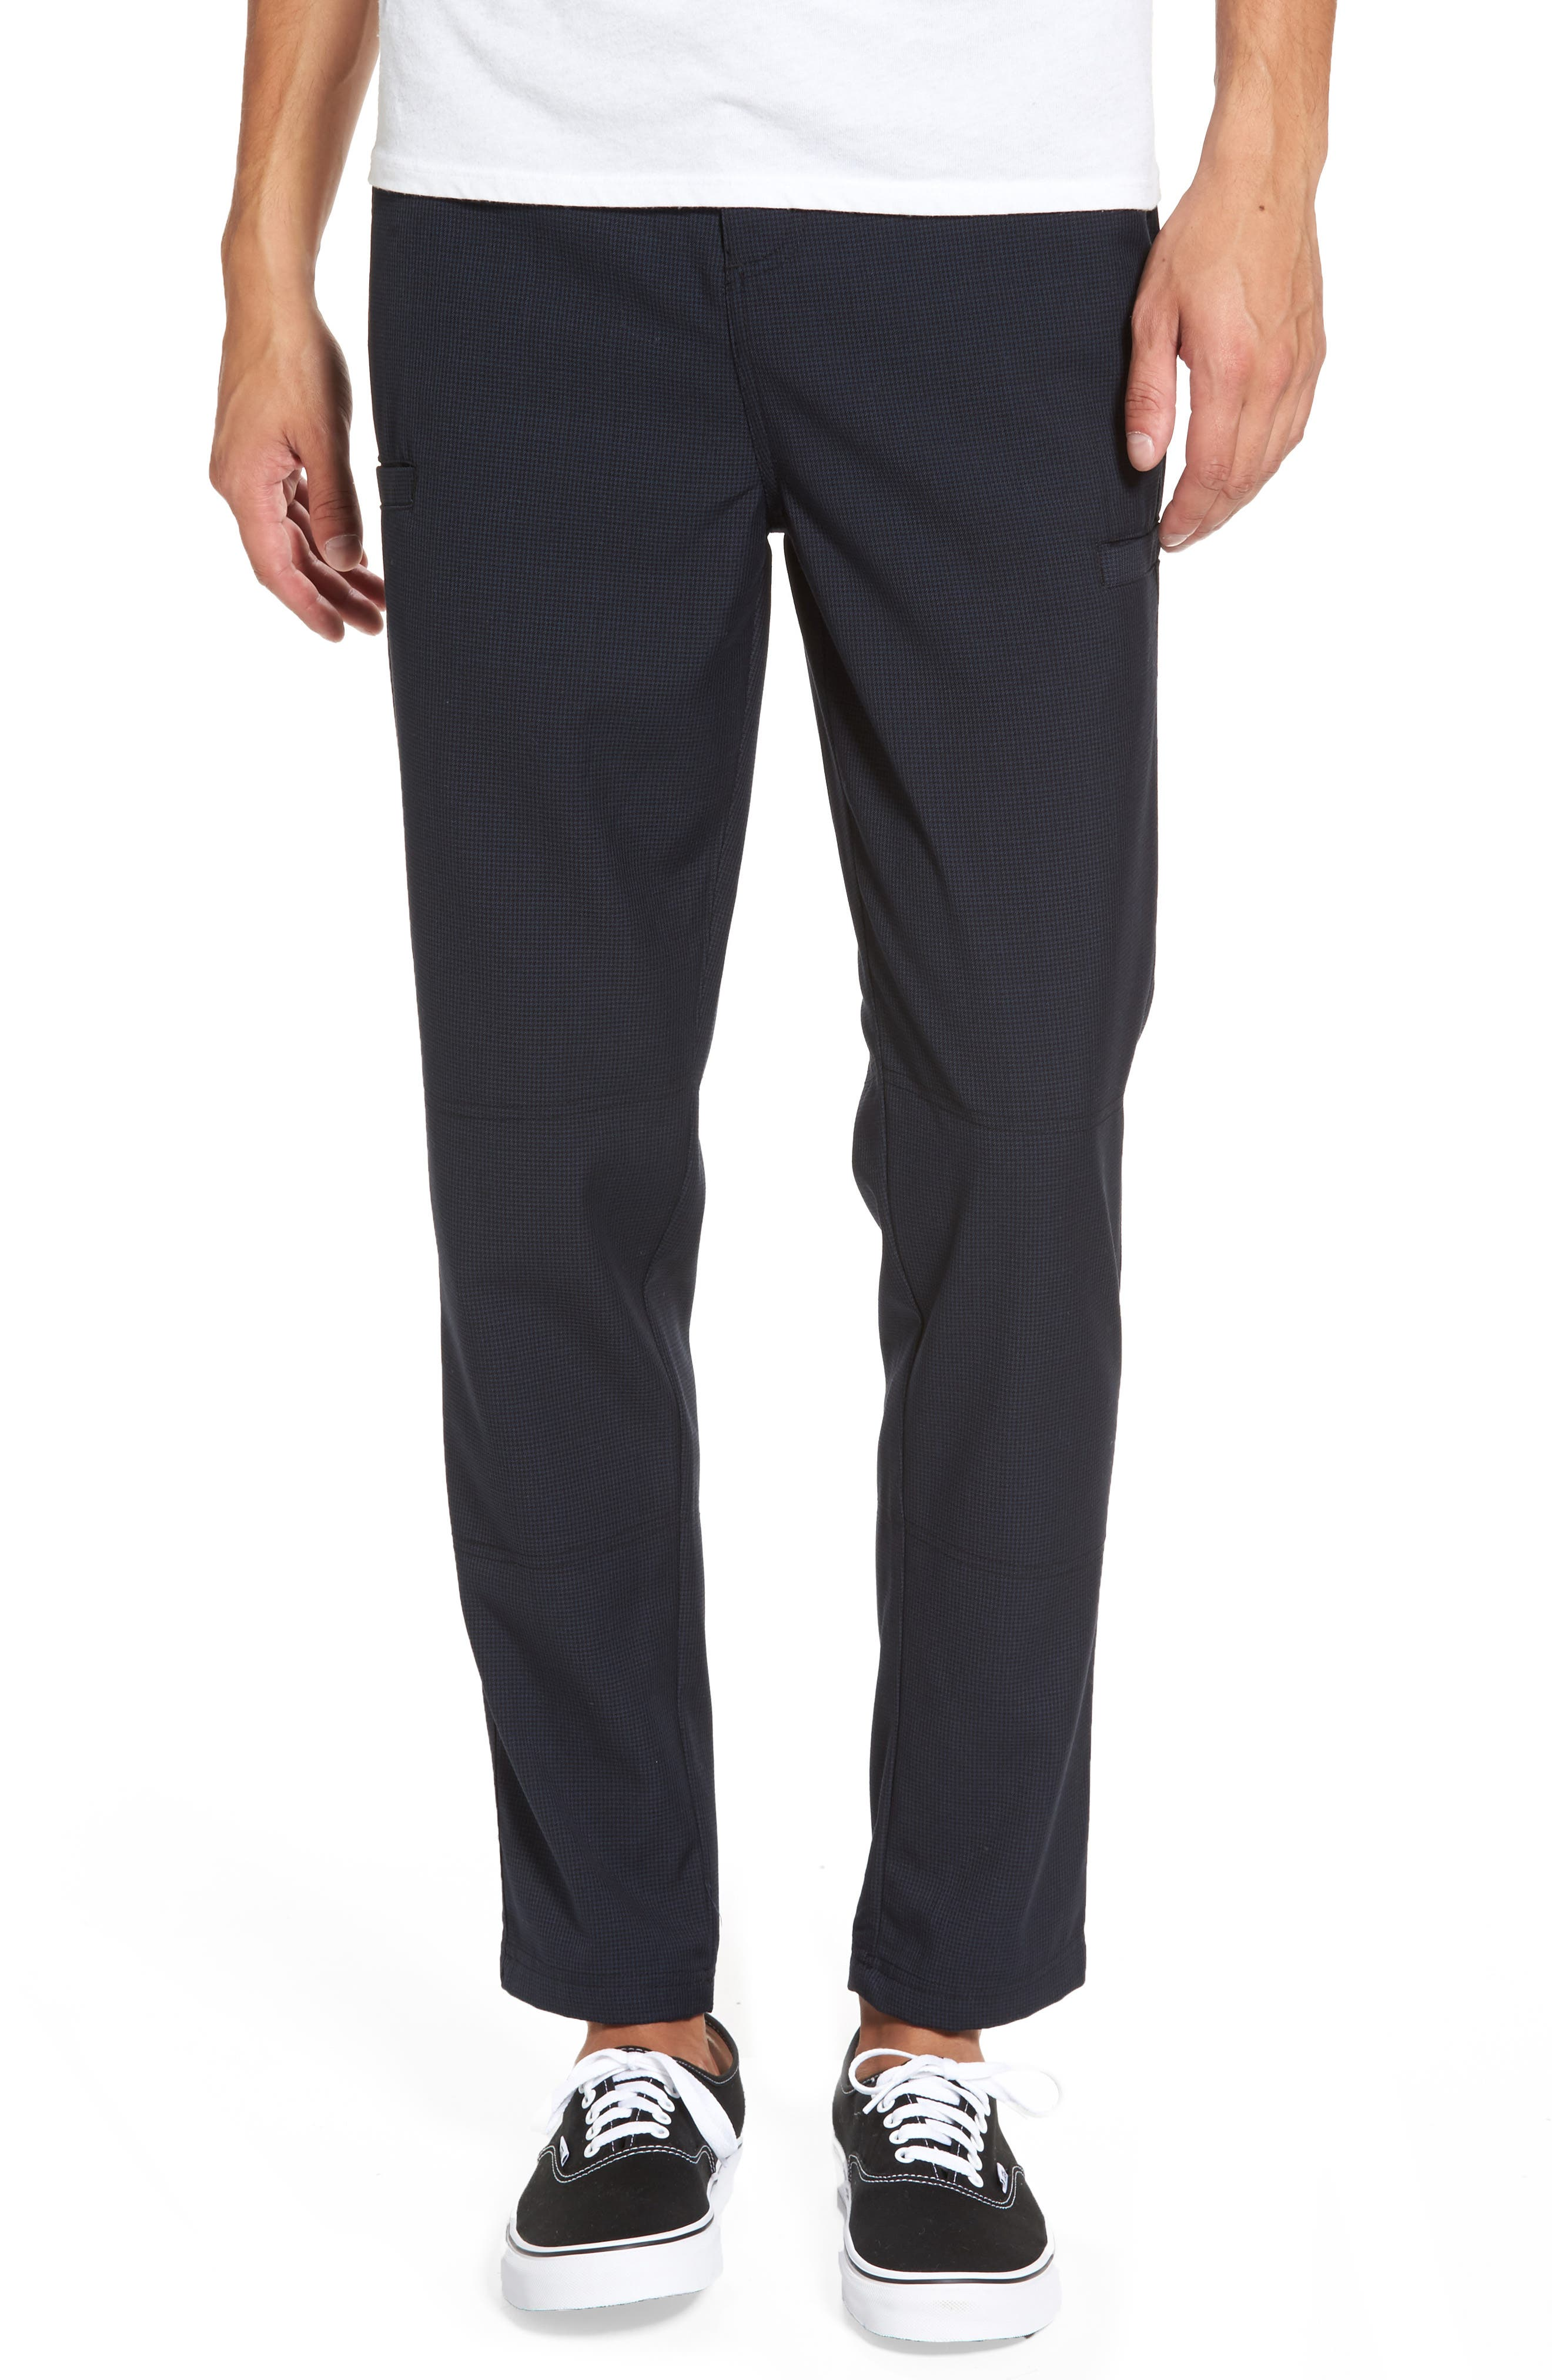 Haycroft Trousers,                             Main thumbnail 1, color,                             Navy